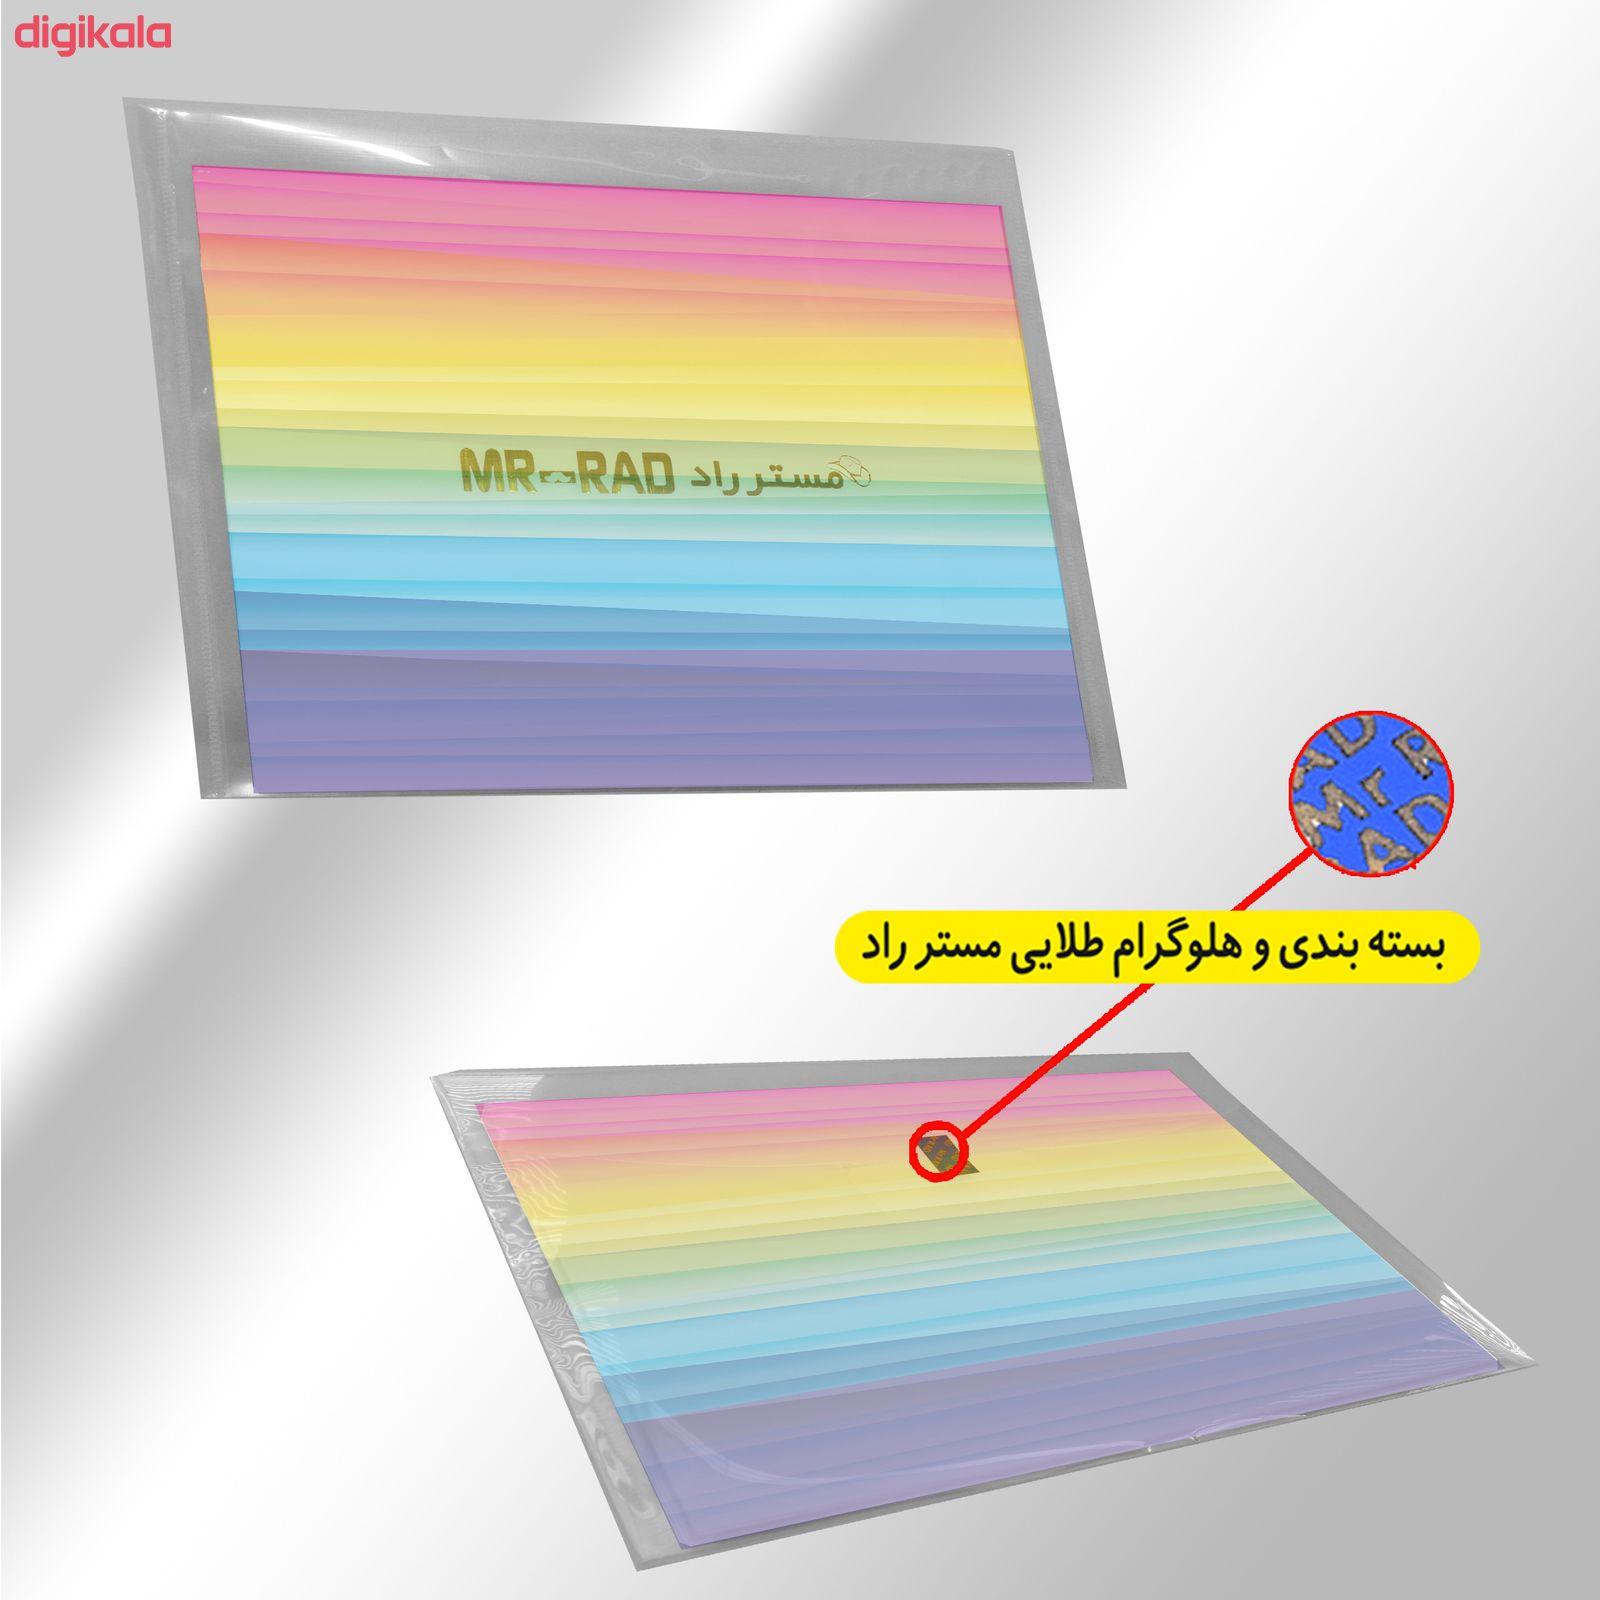 کاغذ رنگی A4 مستر راد مدل رنگارنگ بسته 10 عددی main 1 17